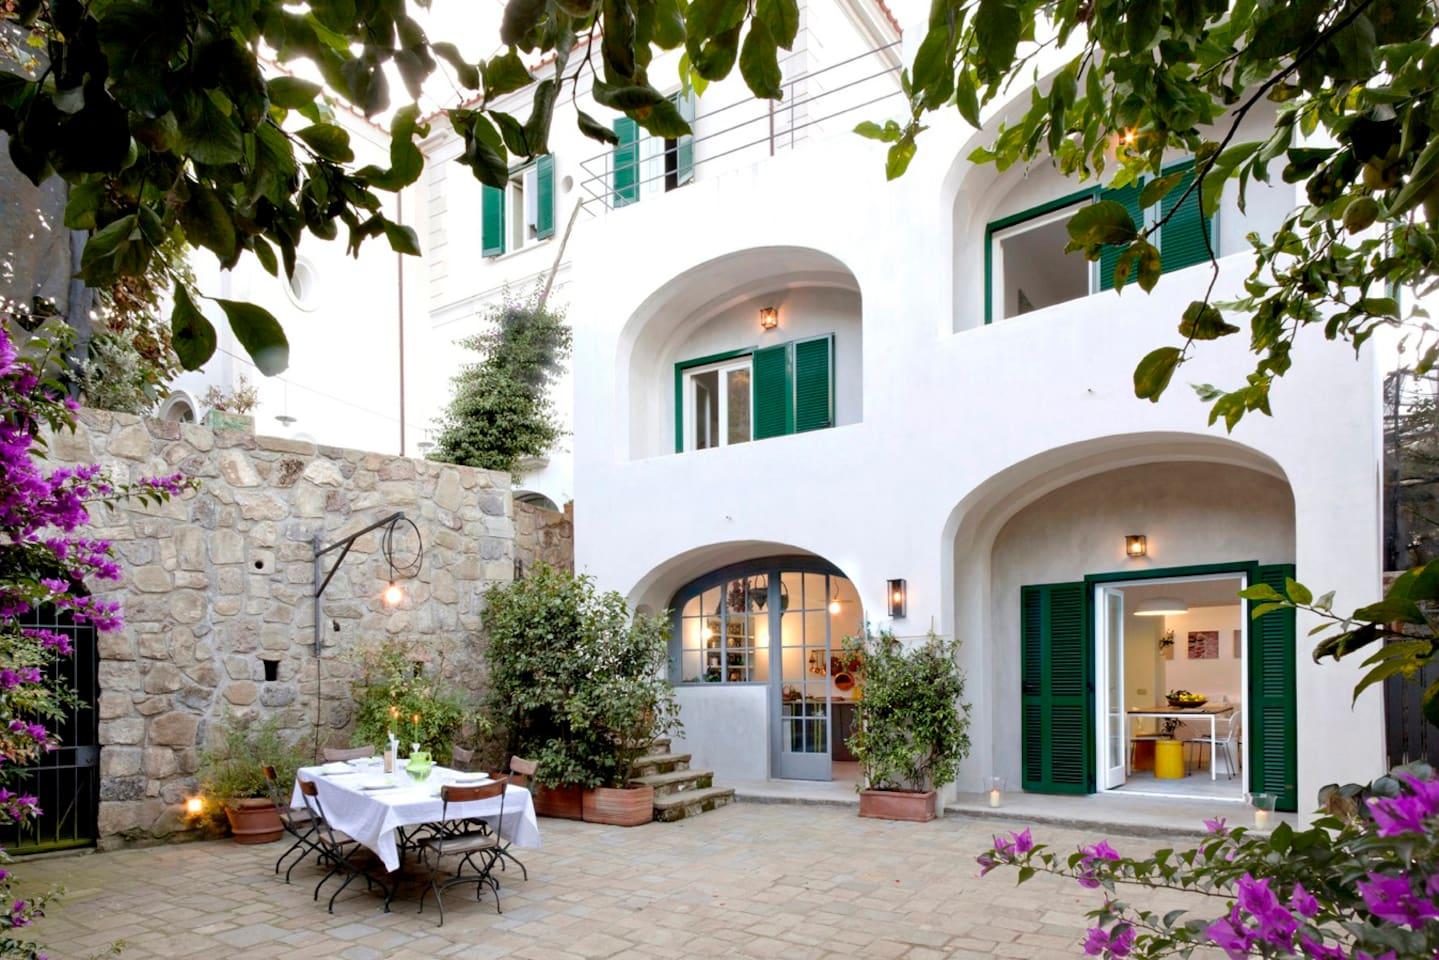 Luxury Design Villa with Pool in Lemon Grove - Villen zur Miete in ...